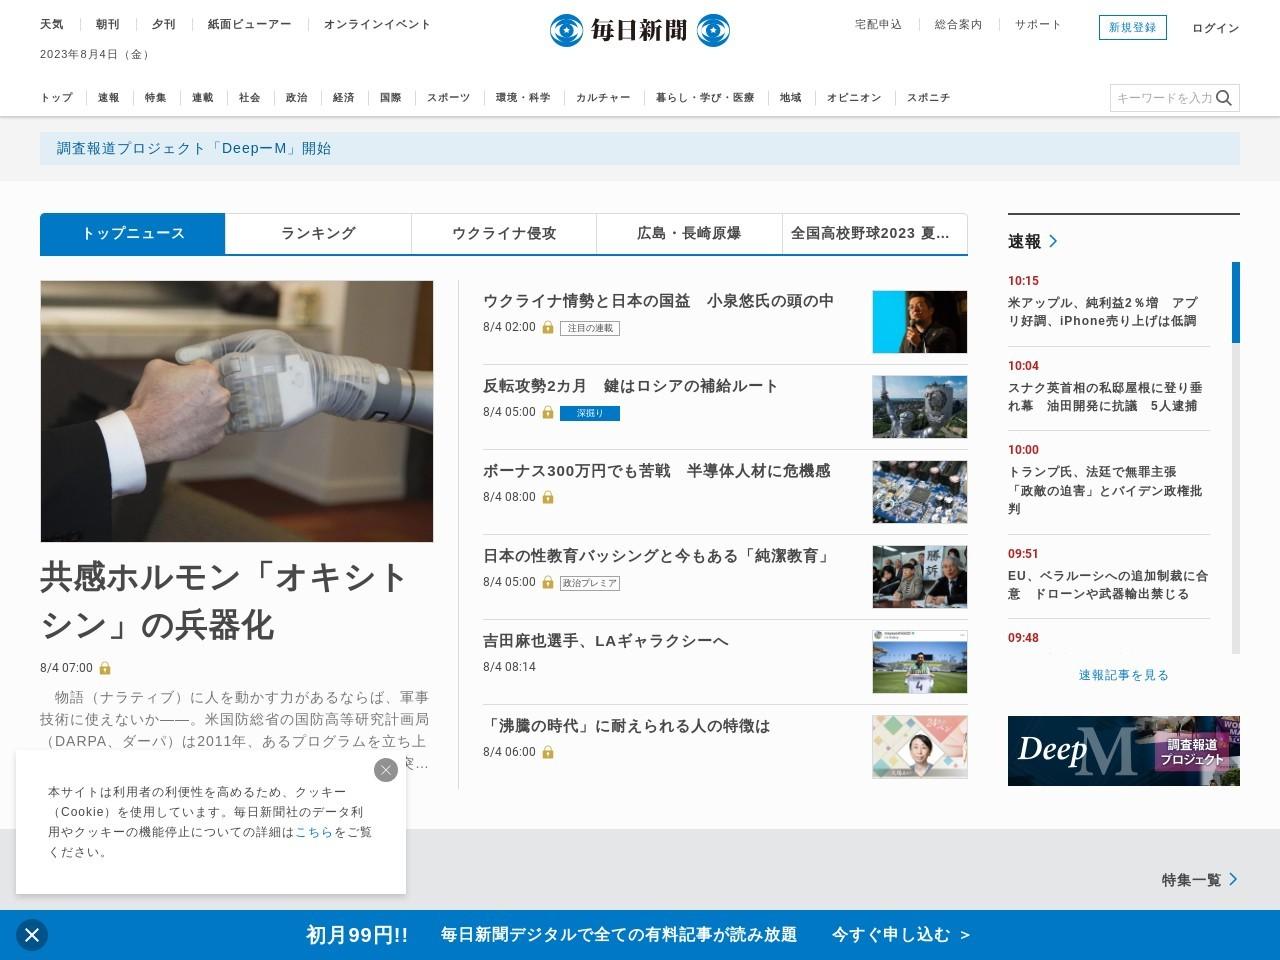 http://mainichi.jp/sumamachi/news.html?cid=20141129mul00m01000100sc